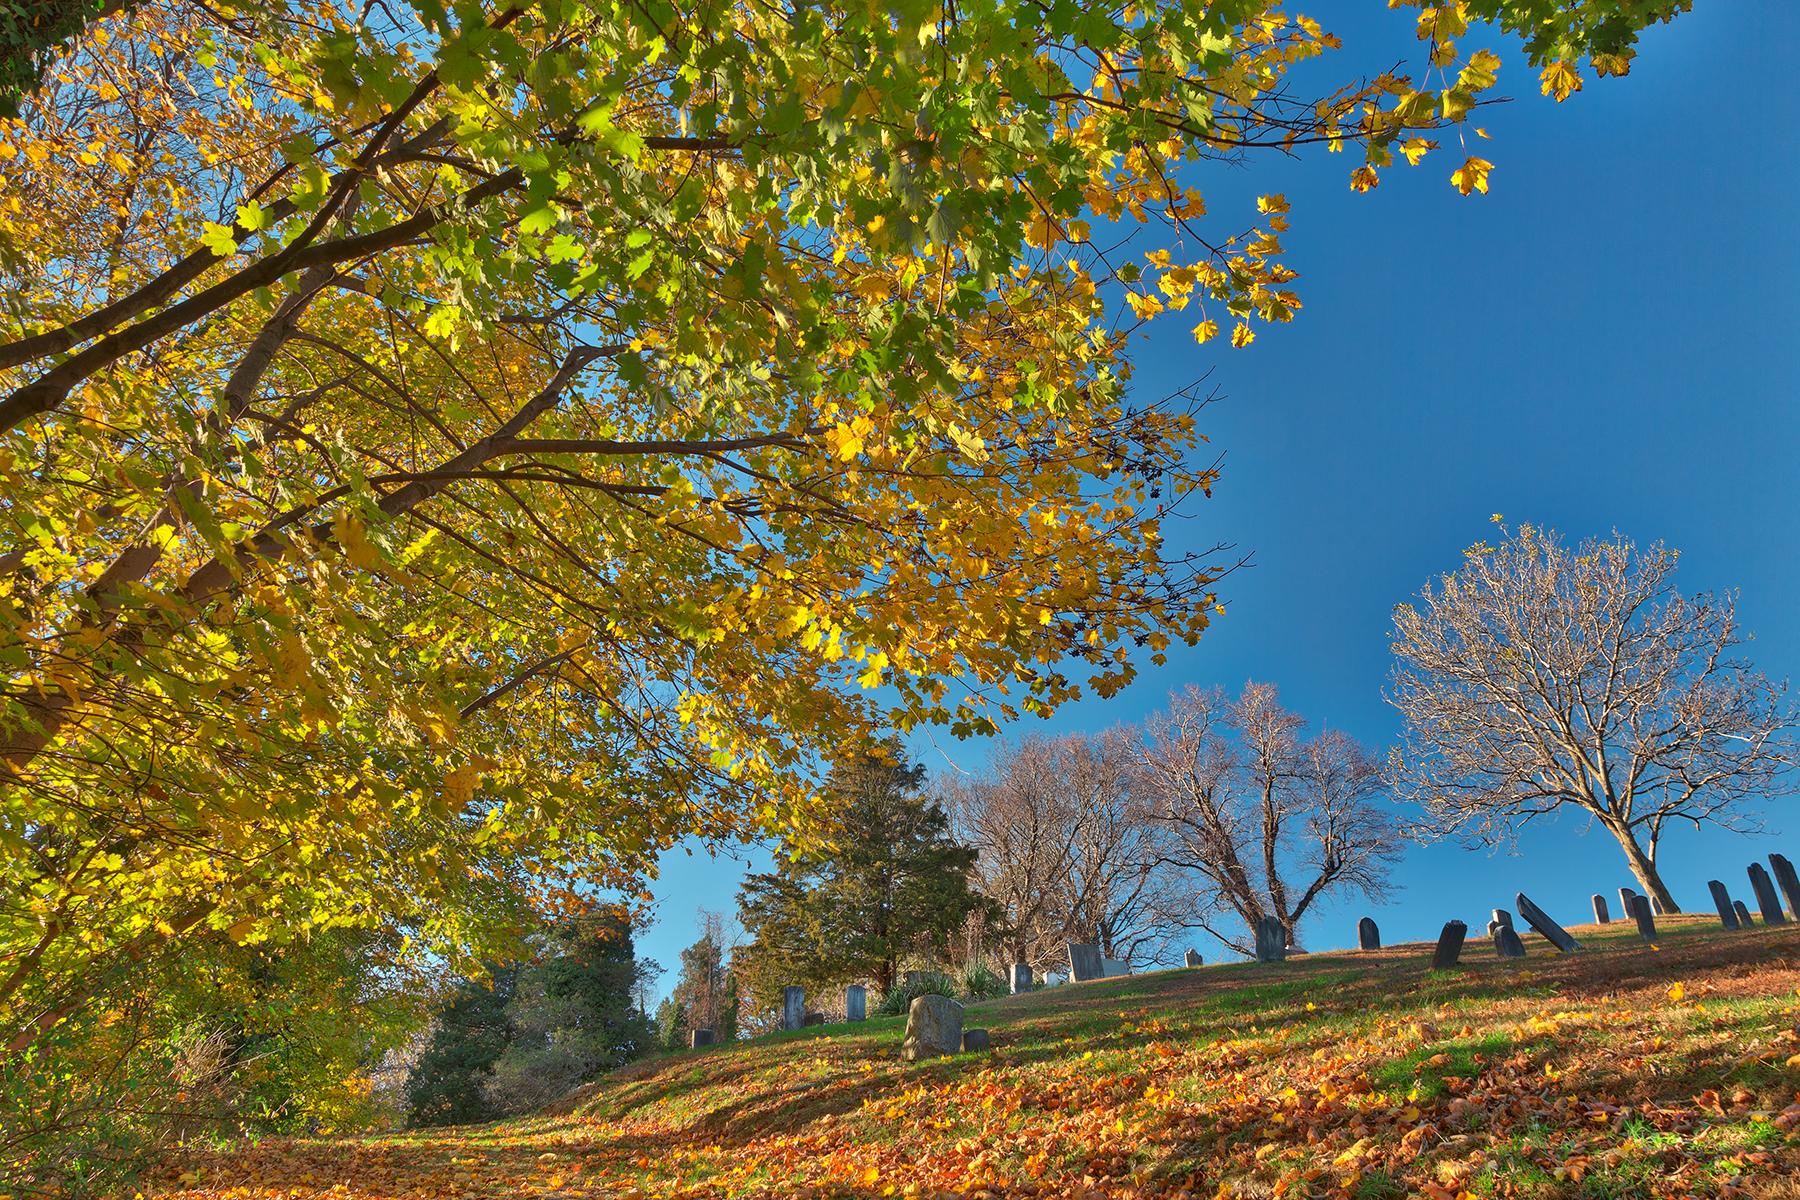 Leaning Fall Cemetery - HDR, America, Pretty, Spiritual, Slanting, HQ Photo